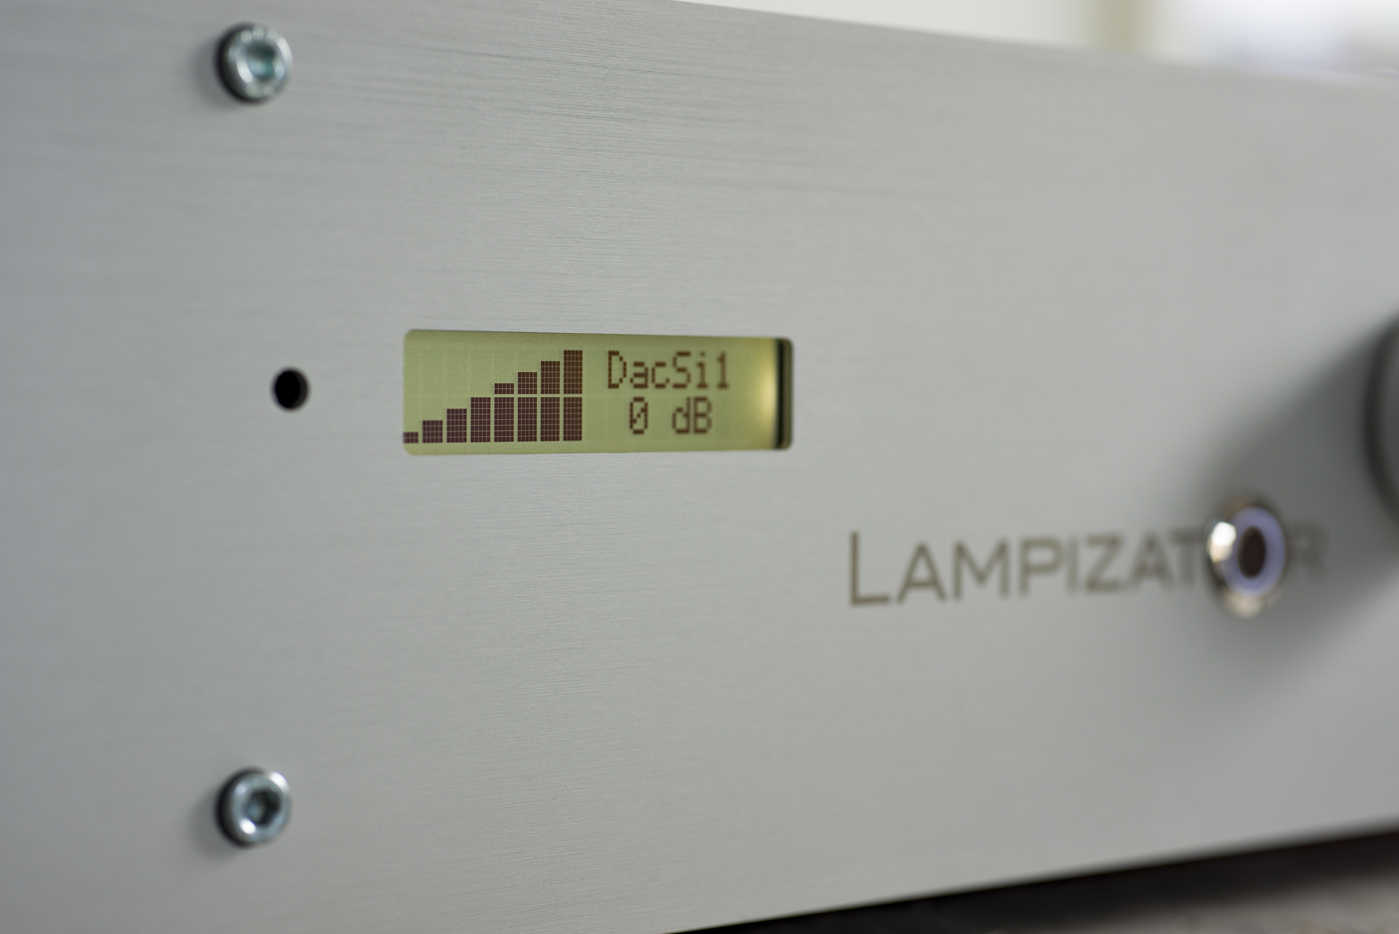 lampizator-dac-7-lite-preamp-valve-004.jpg